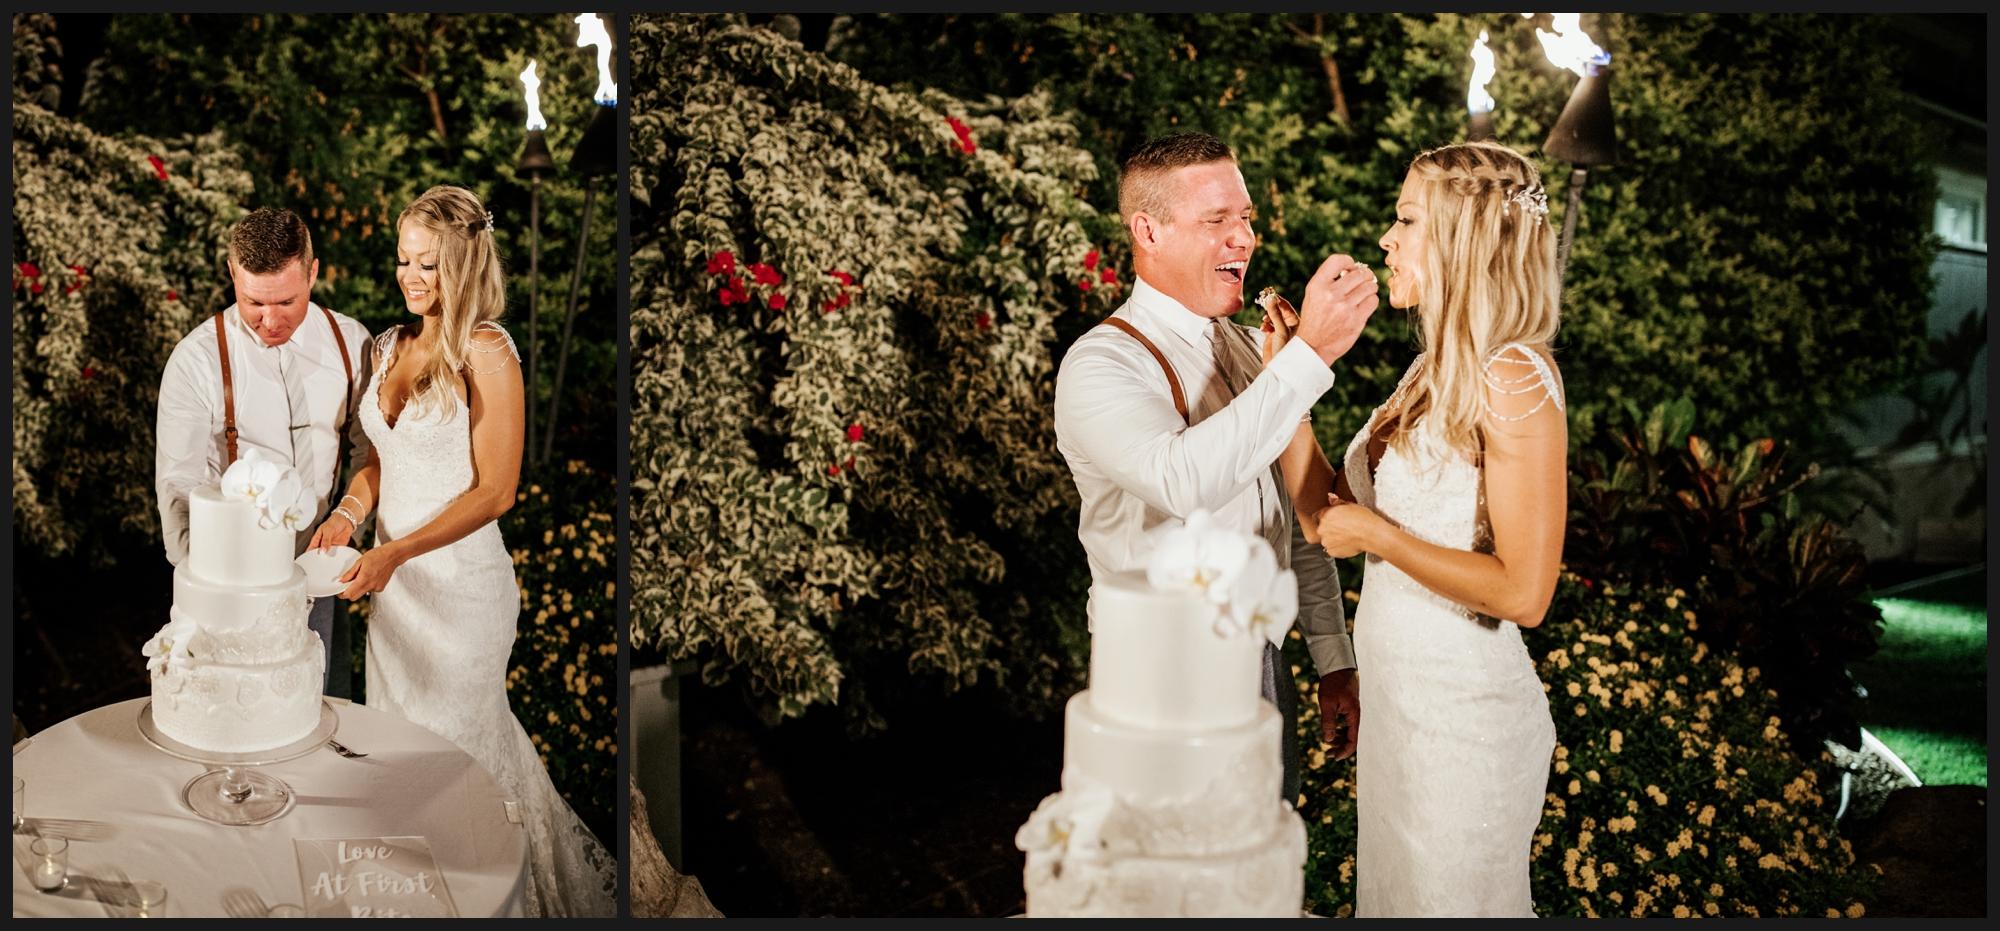 Orlando-Wedding-Photographer-destination-wedding-photographer-florida-wedding-photographer-hawaii-wedding-photographer_0020.jpg